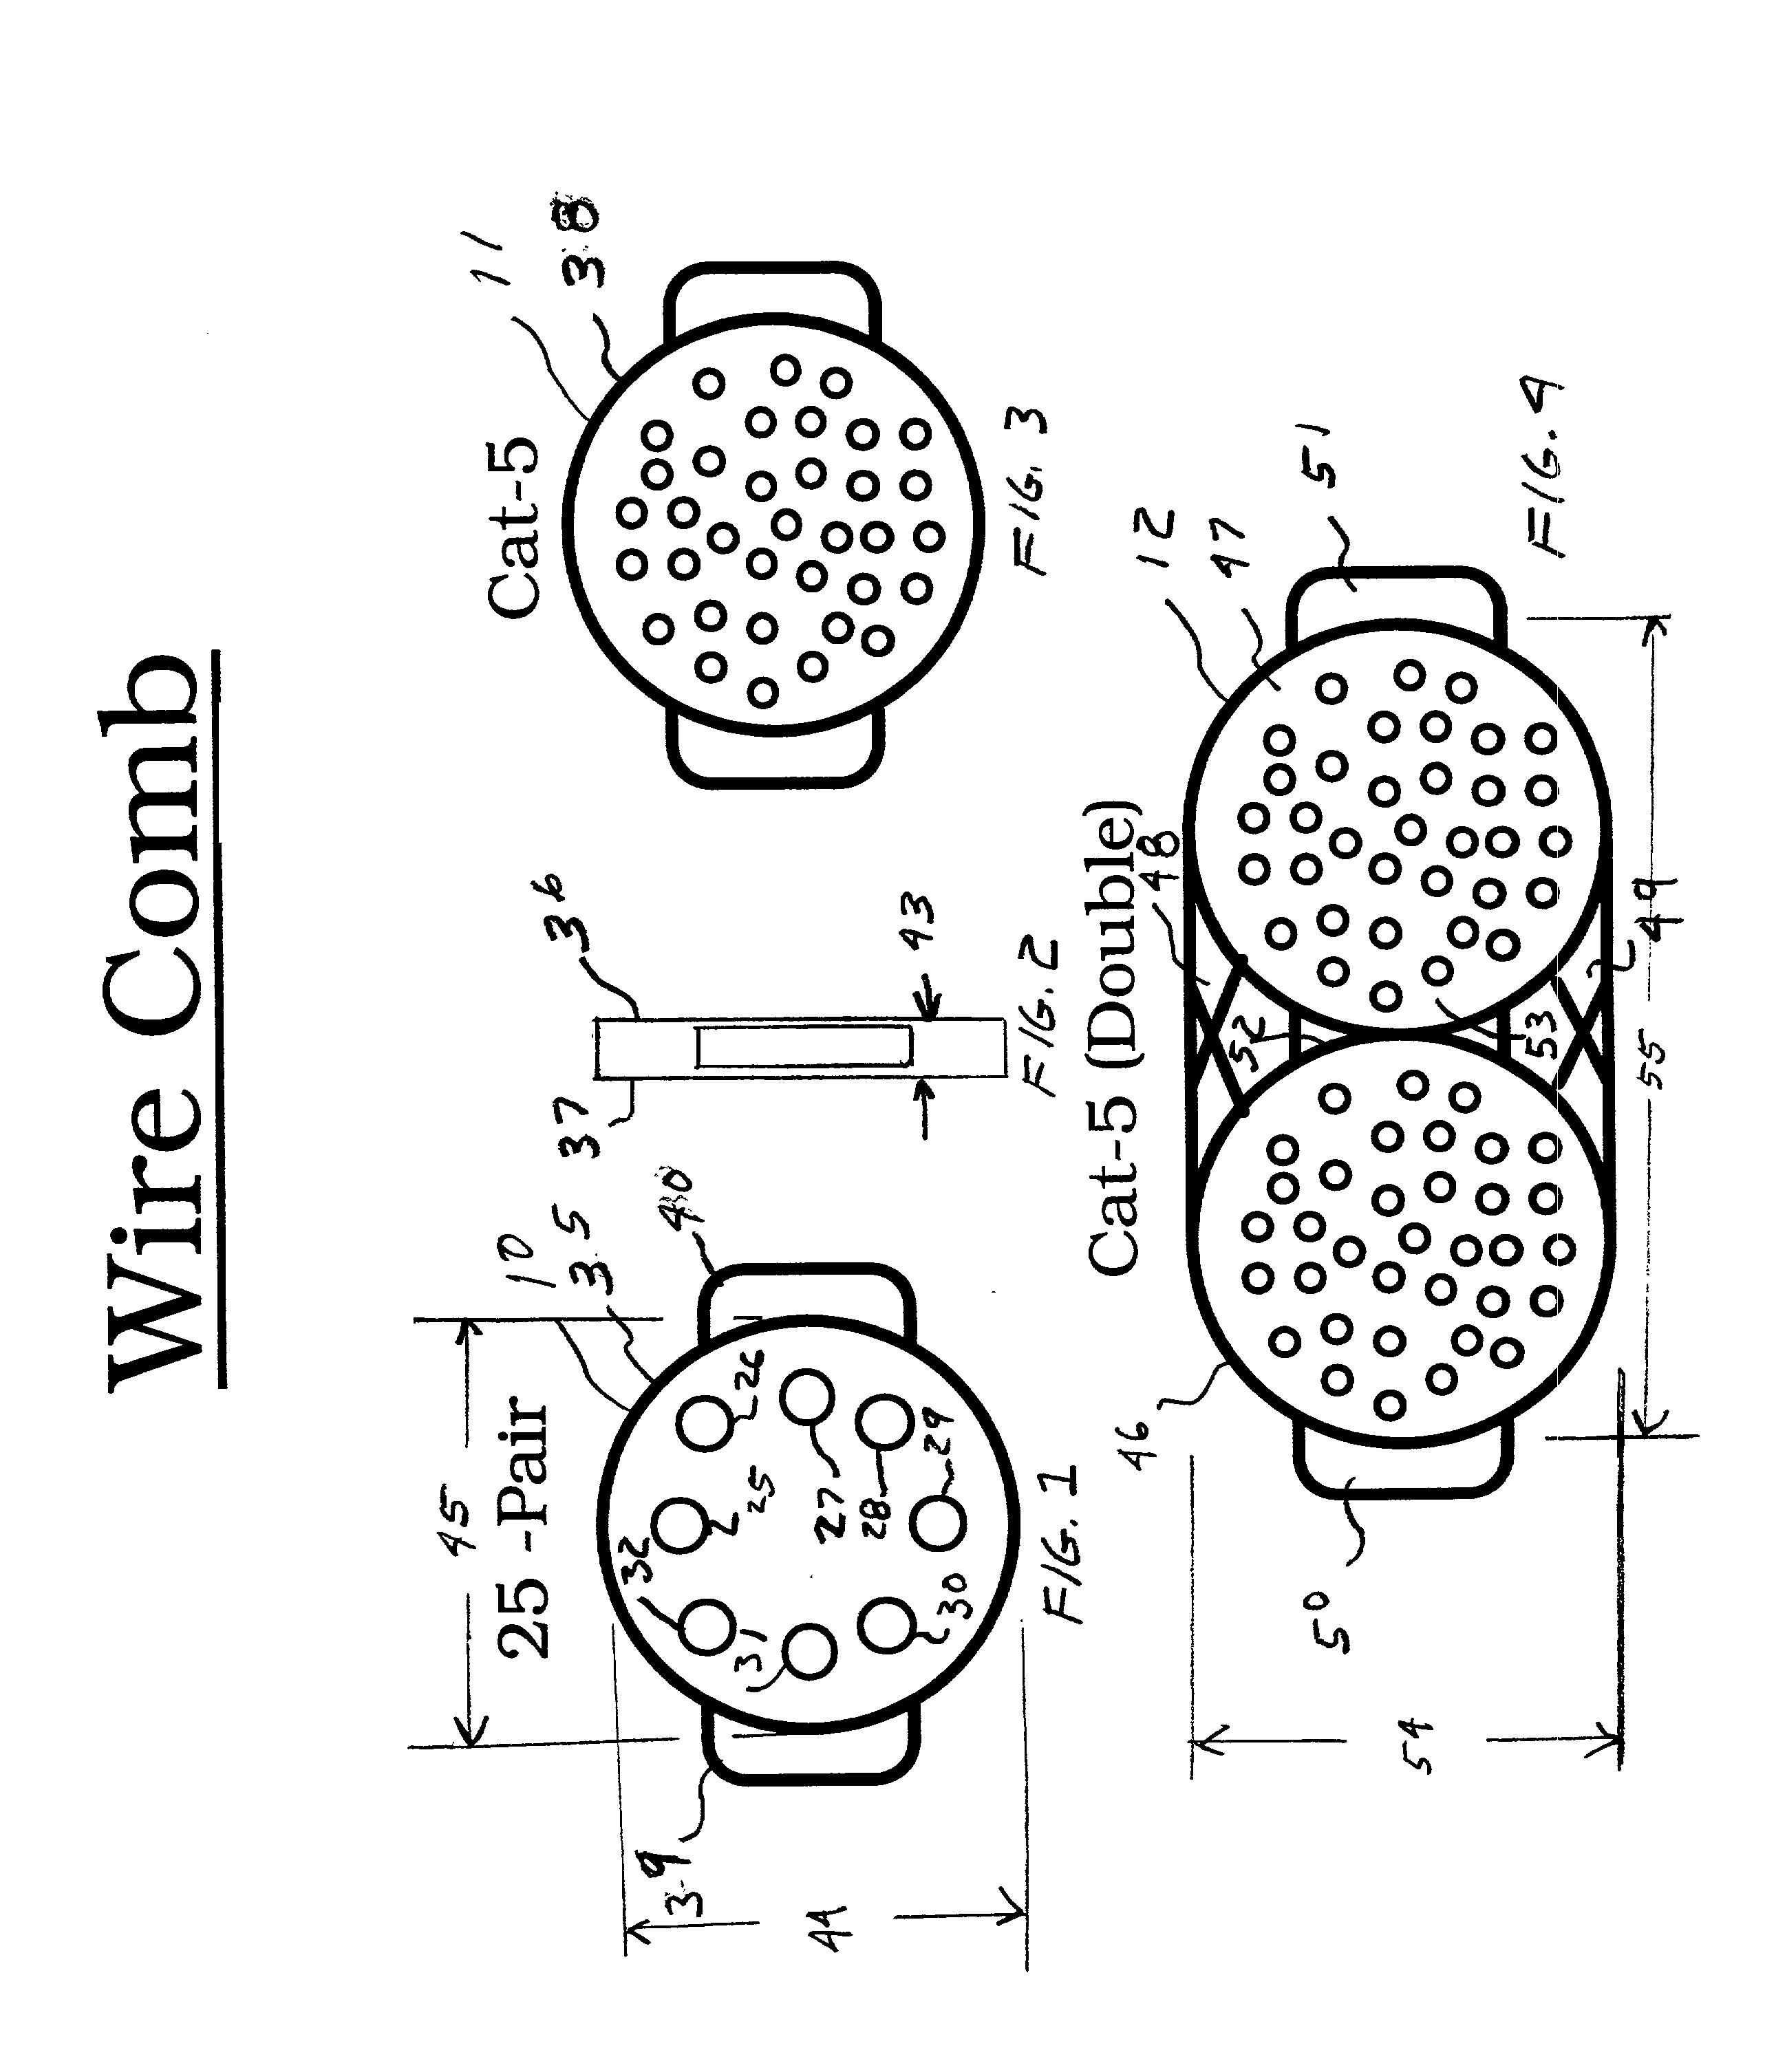 patent us20020104577 - wire comb